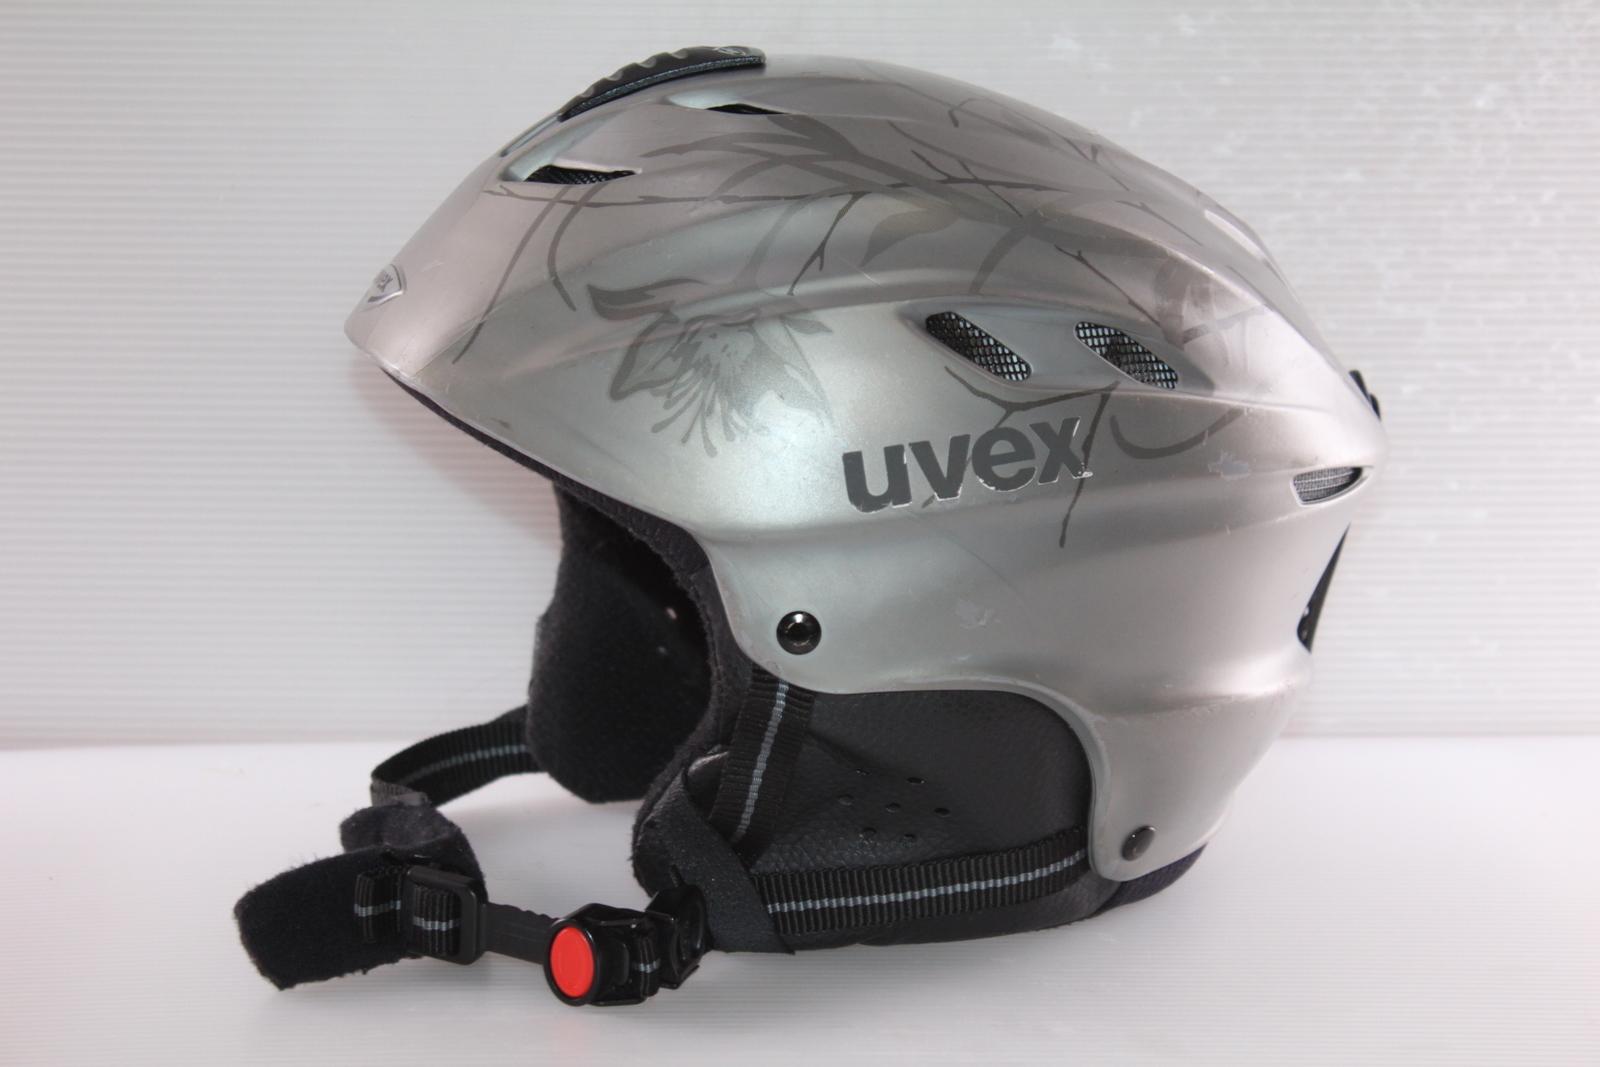 Dámská lyžařská helma Uvex  - posuvná vel. 58 - 61